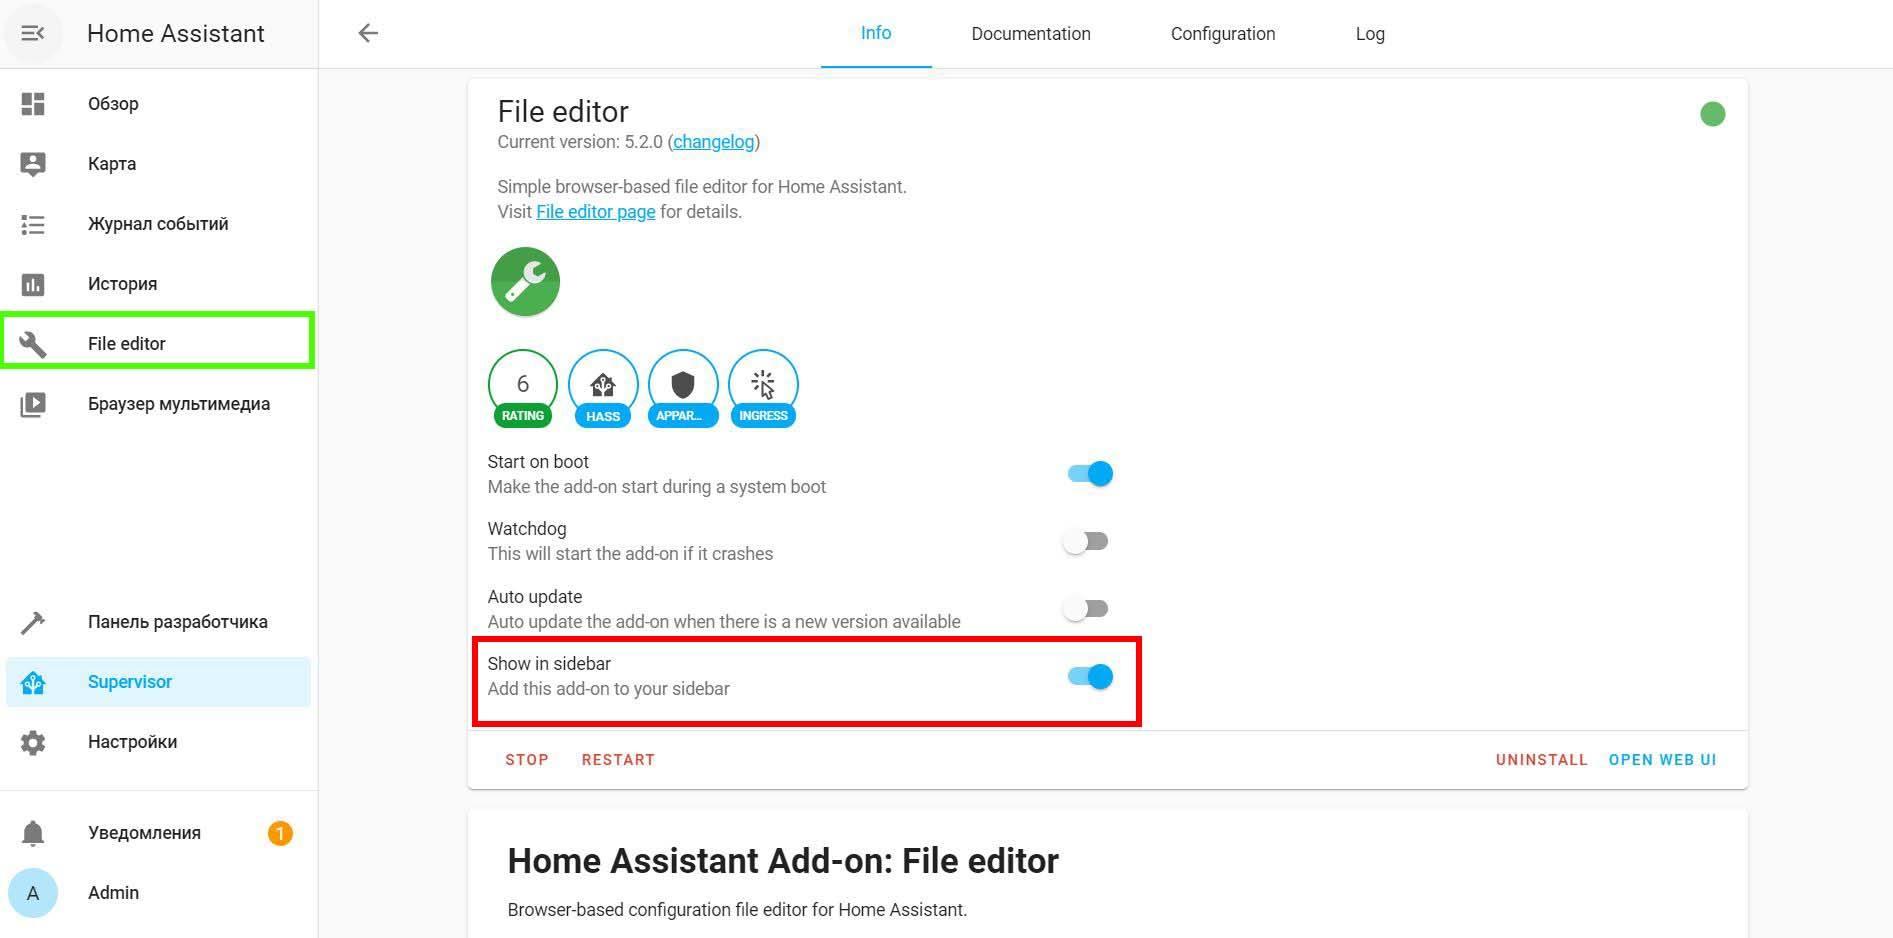 Быстрый доступ к File Editor